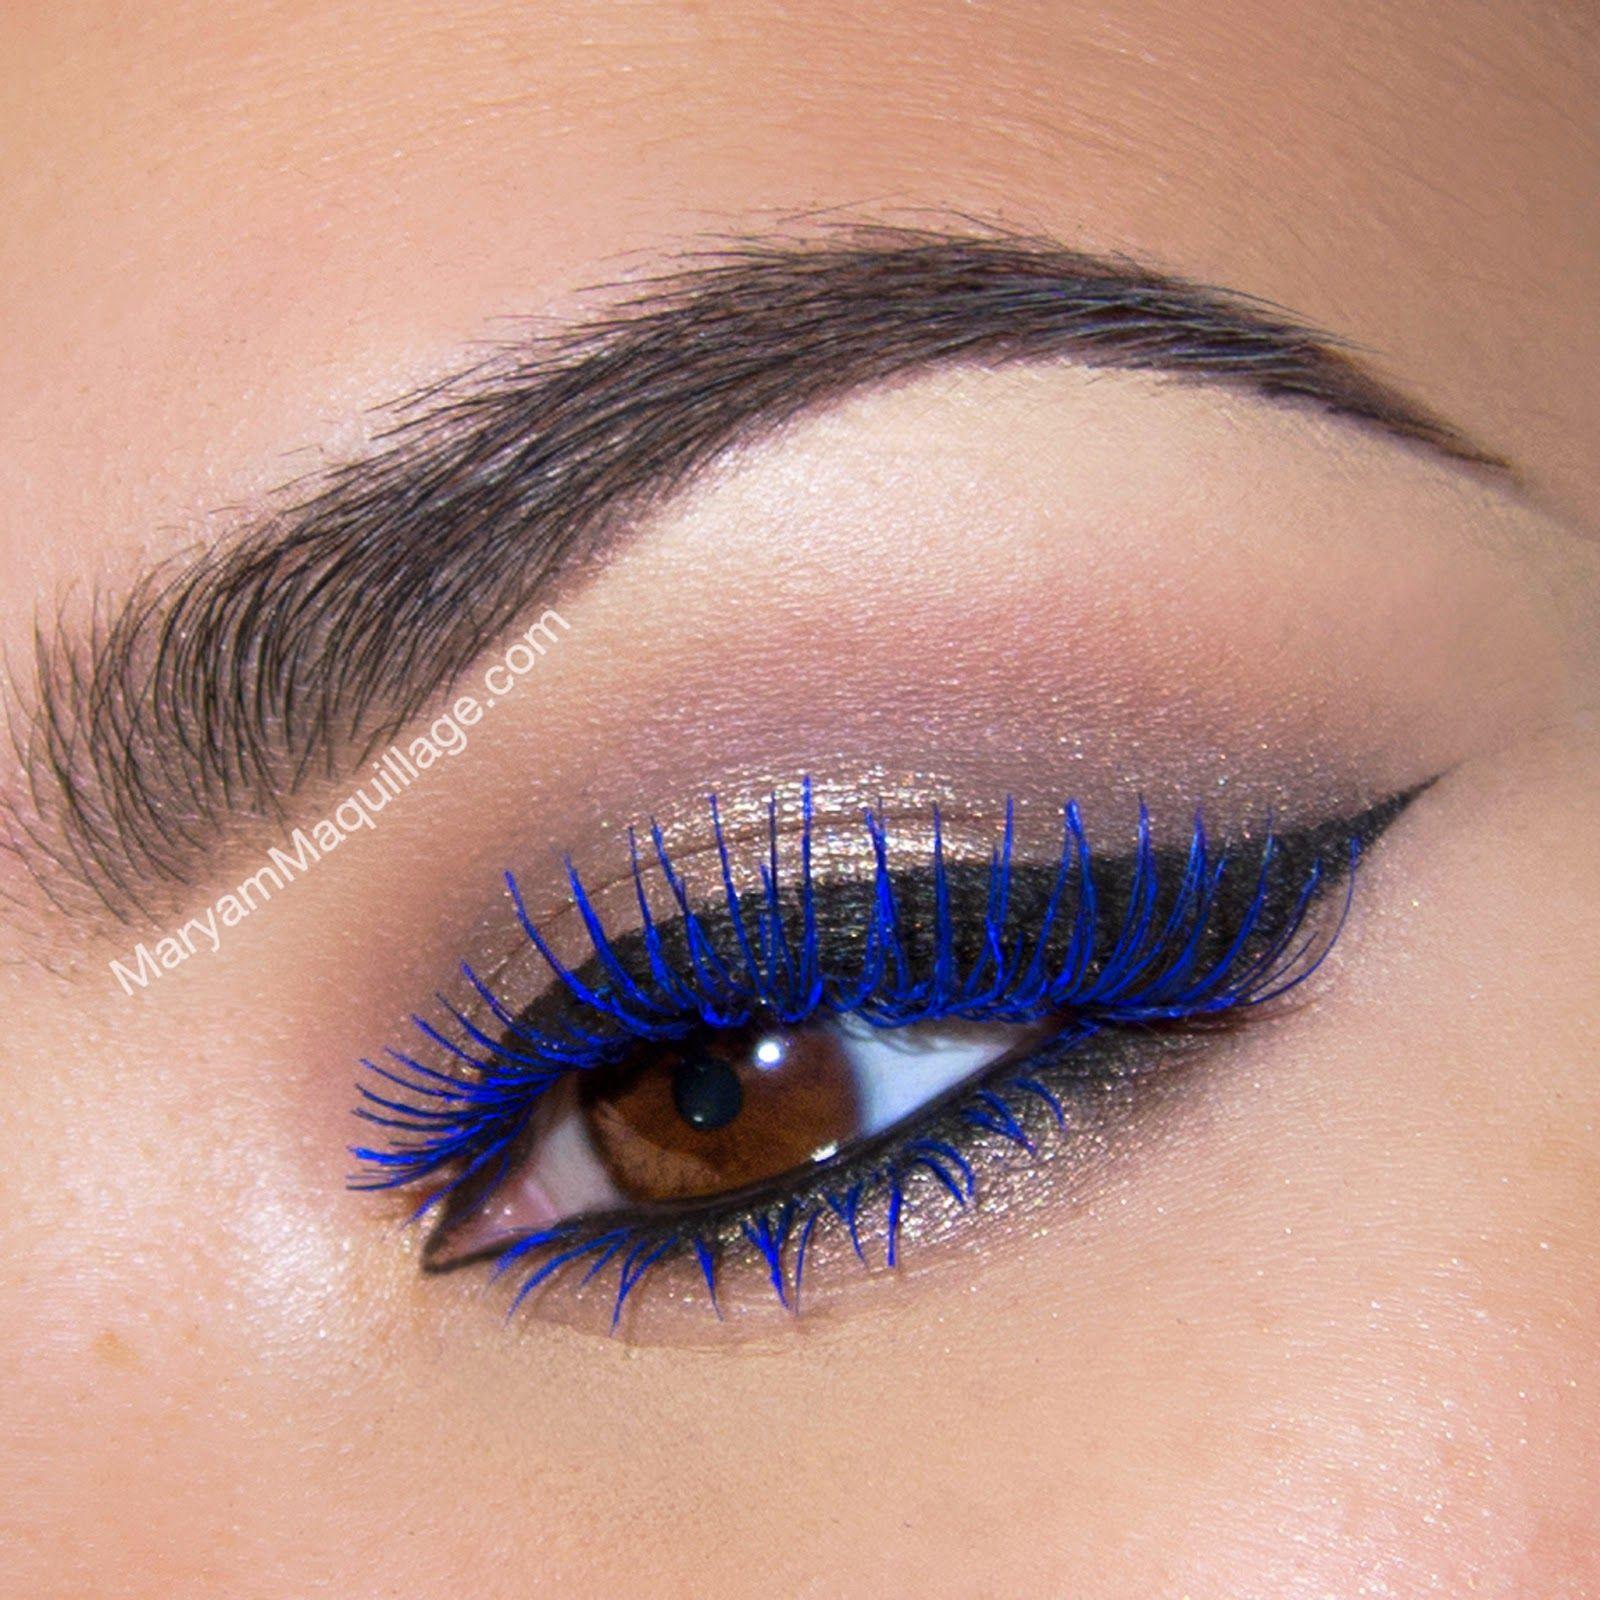 Summer Makeup Blue Lashes Blue mascara, Blue makeup